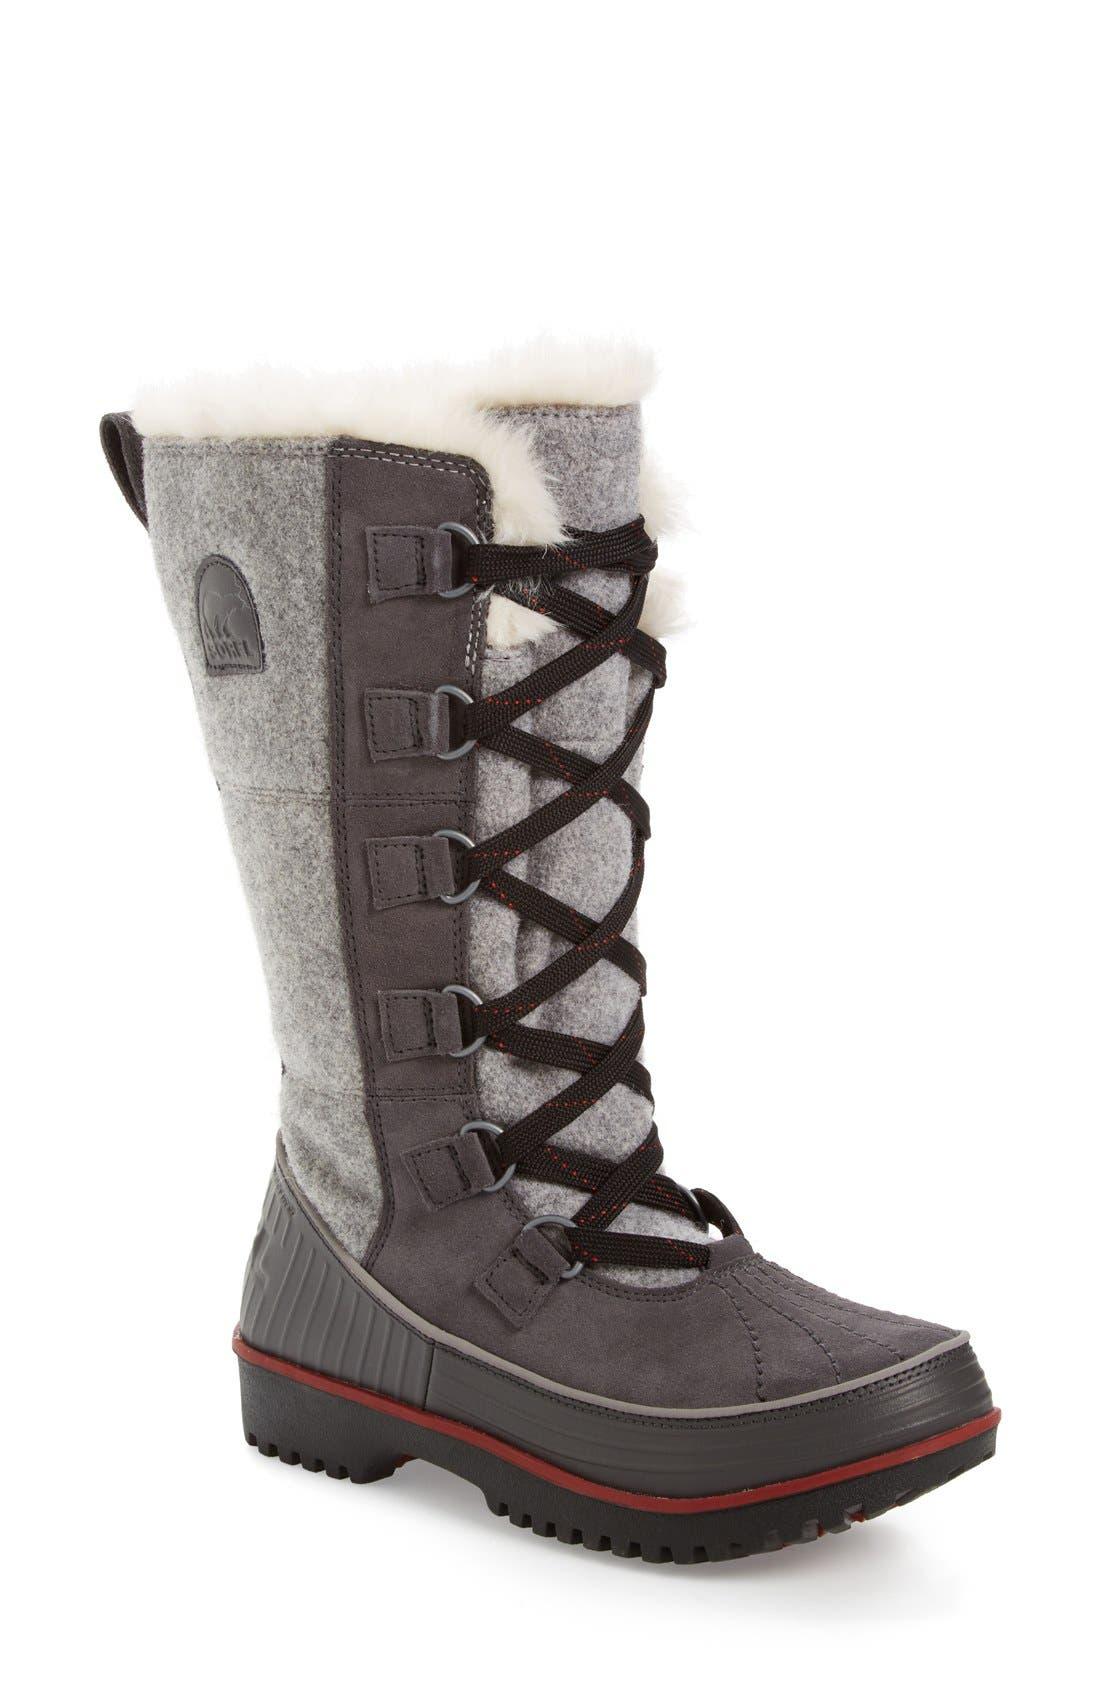 Main Image - SOREL 'Tivoli High II' Boot (Women)